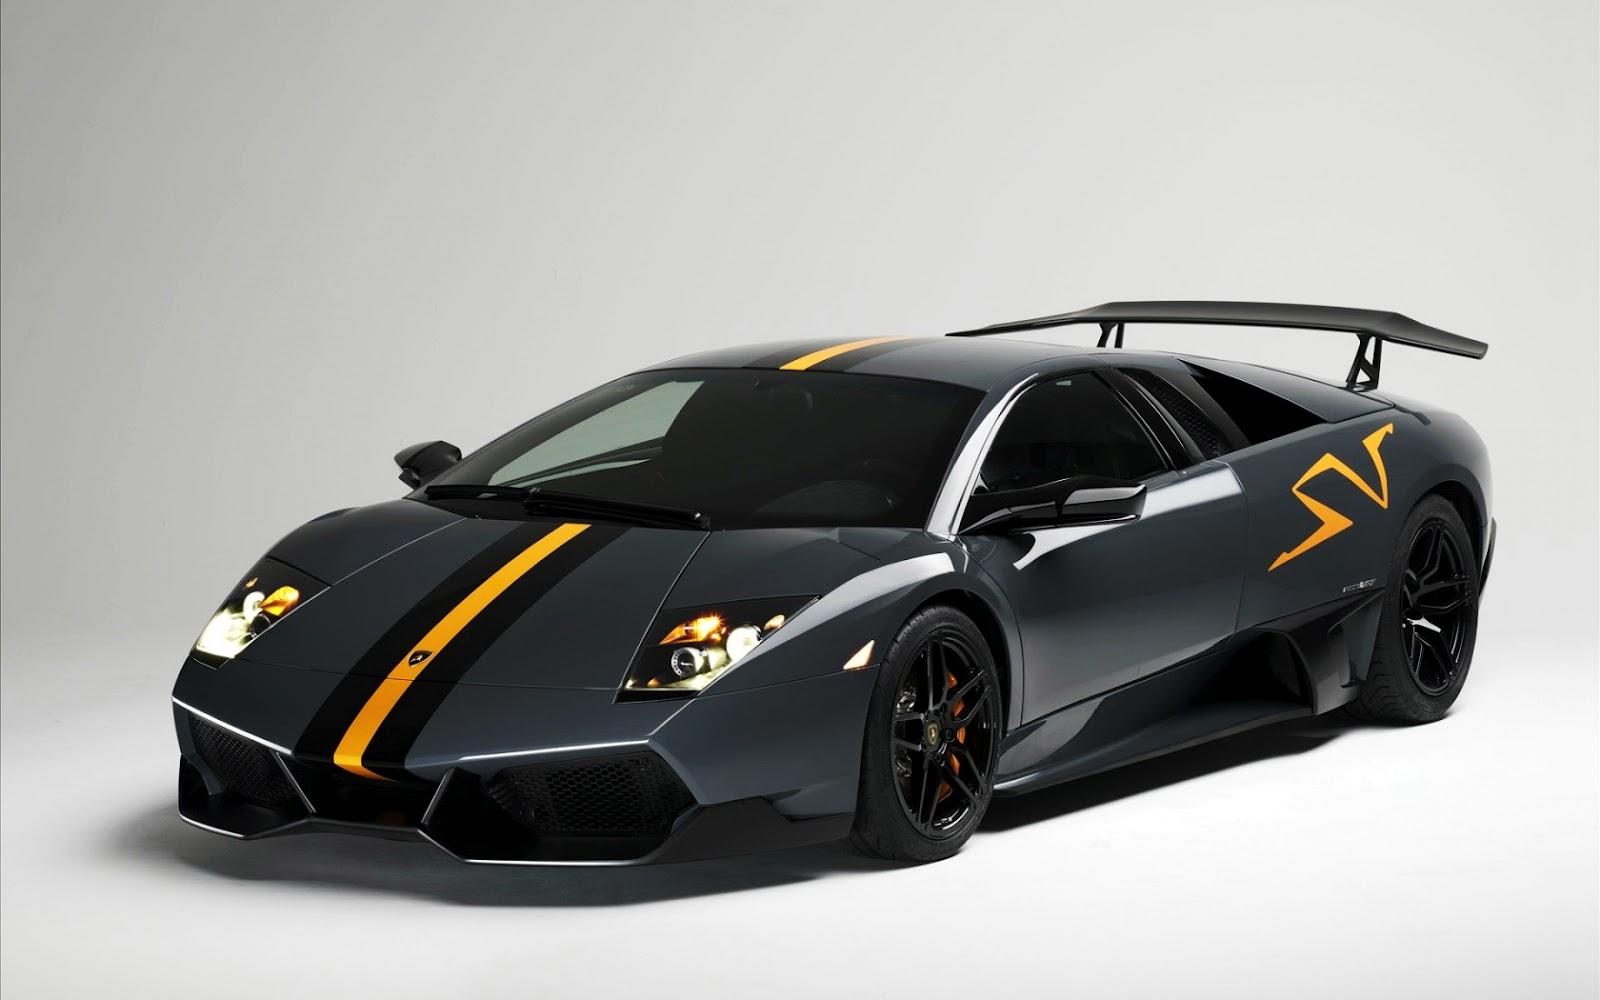 HIGH DEFINITION 1080p wallpapers of Lamborghini: 1080p wallpapers of Lamborghini